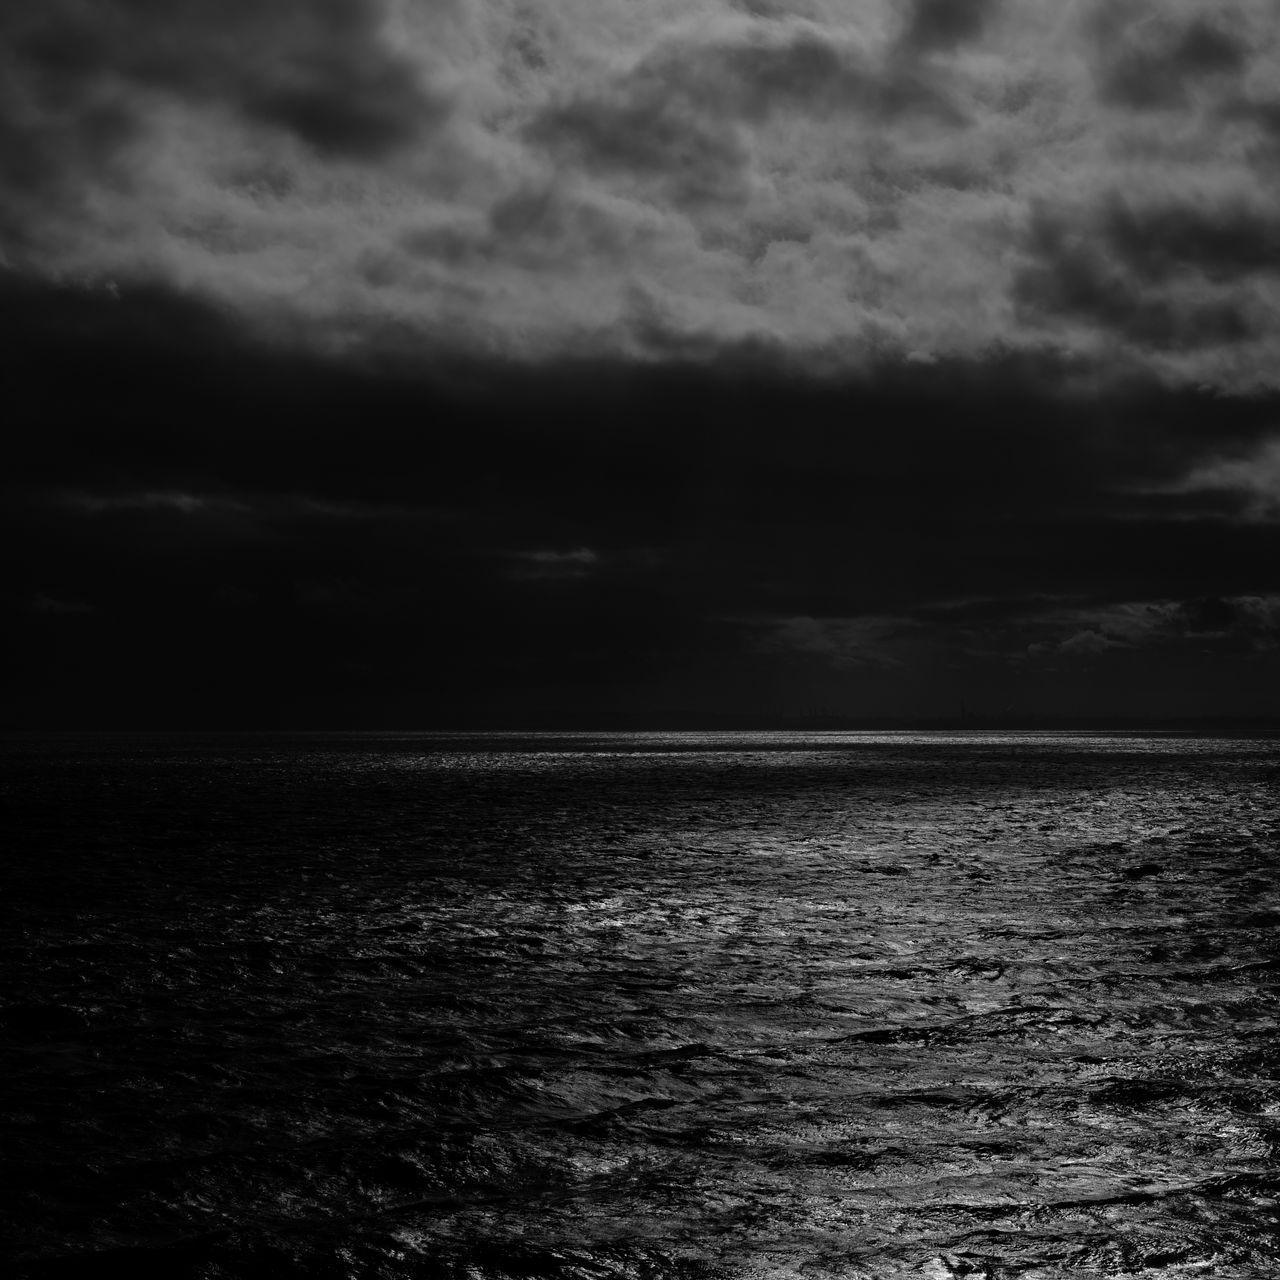 1280x1280 Wallpaper sea, horizon, bw, overcast, clouds, ripples